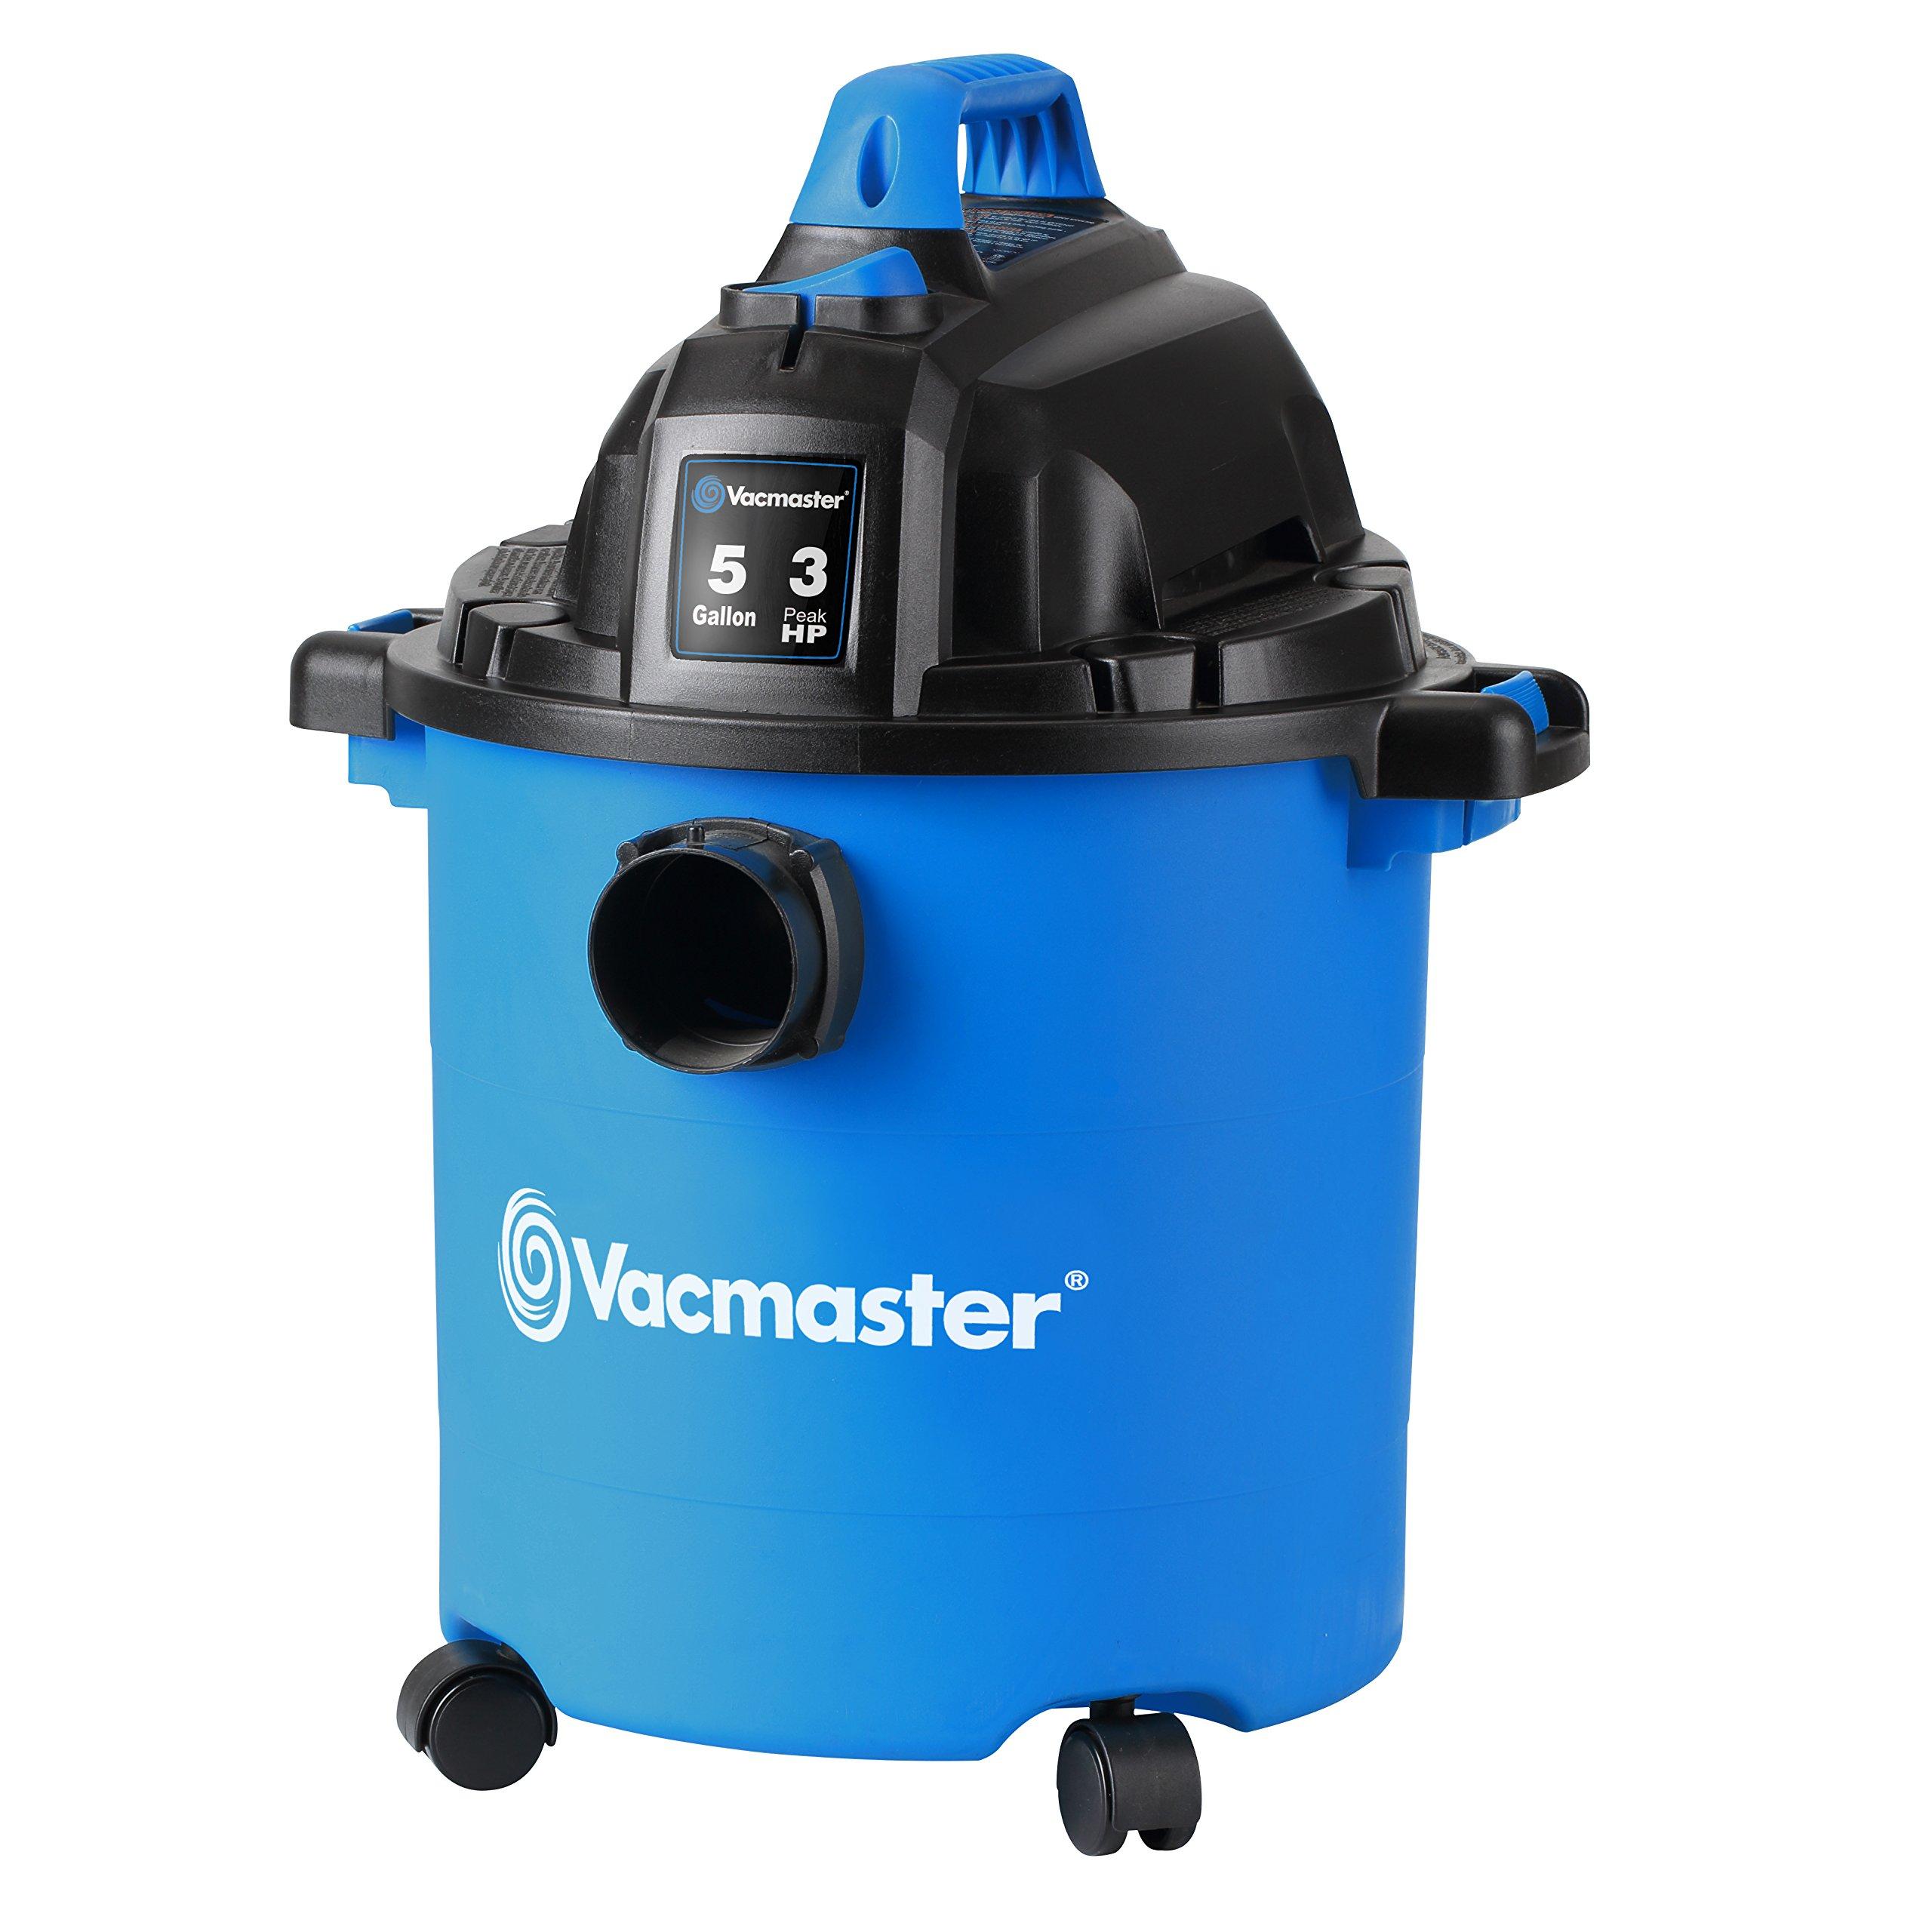 Vacmaster, VJC507P, 5 Gallon 3 Peak HP Wet/Dry Shop Vacuum by Vacmaster